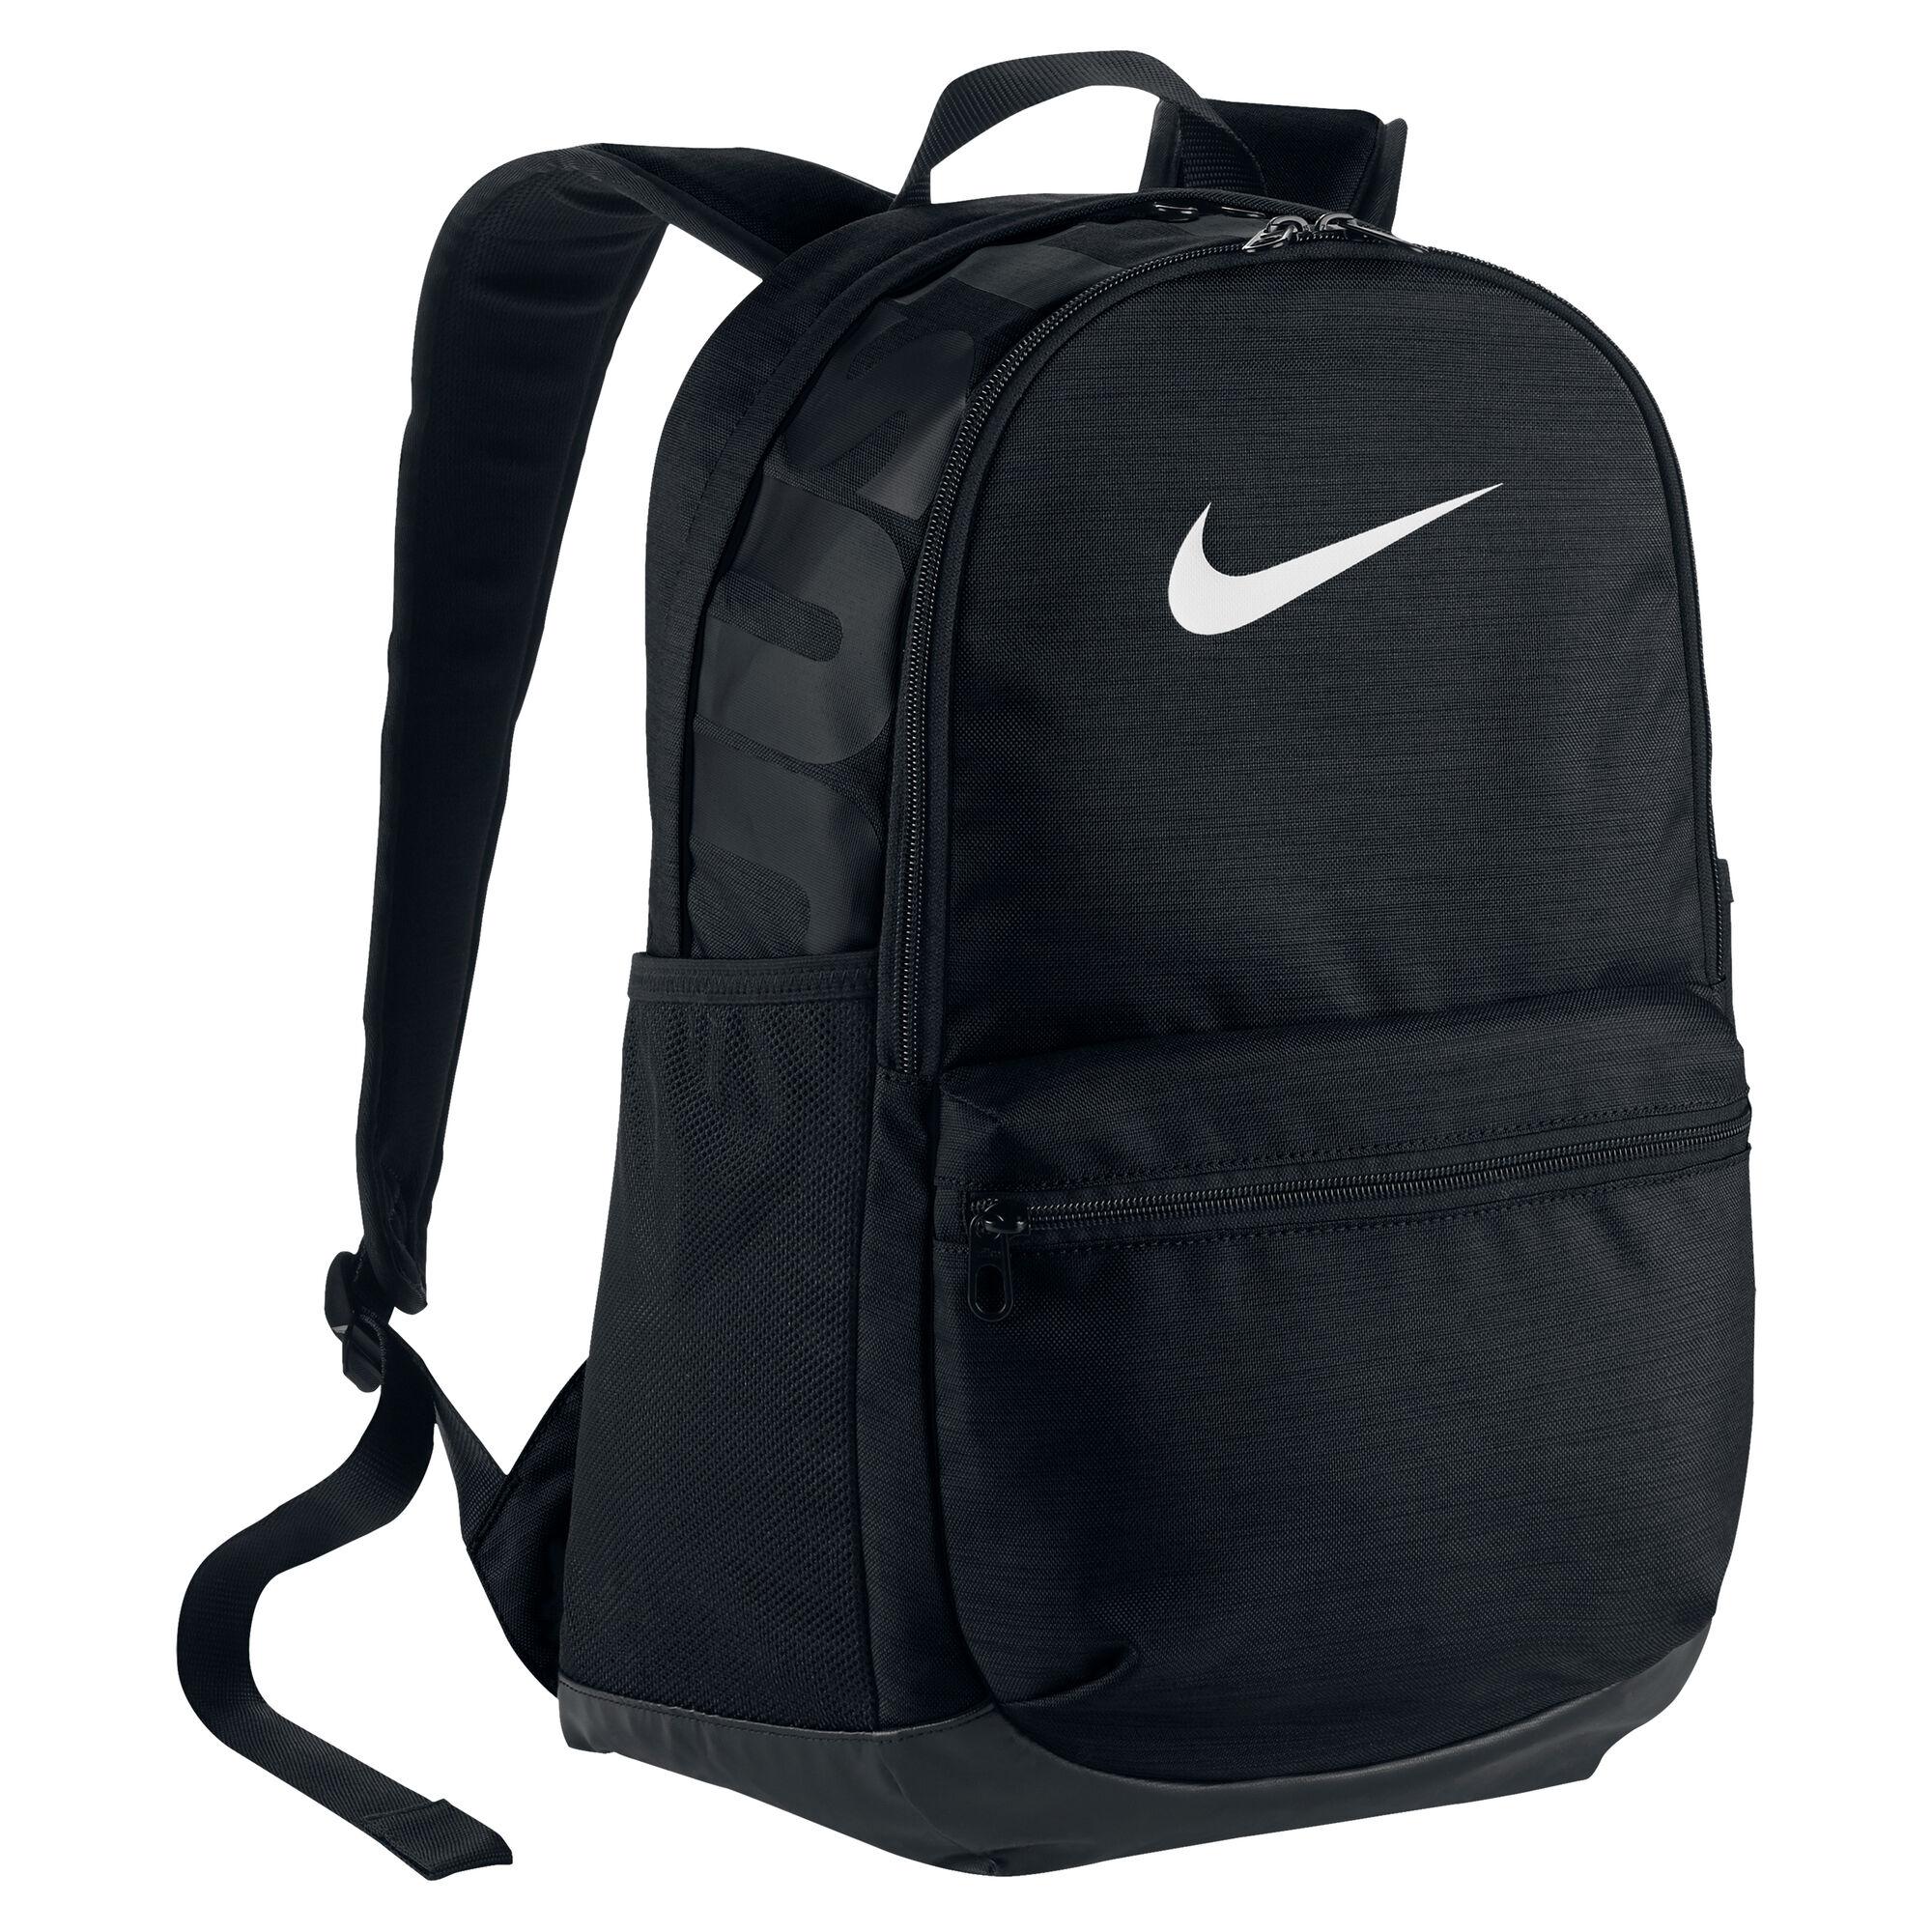 1852f0cdd58 Nike Brasilia Training Rugzak Midden - Zwart, Wit online kopen ...